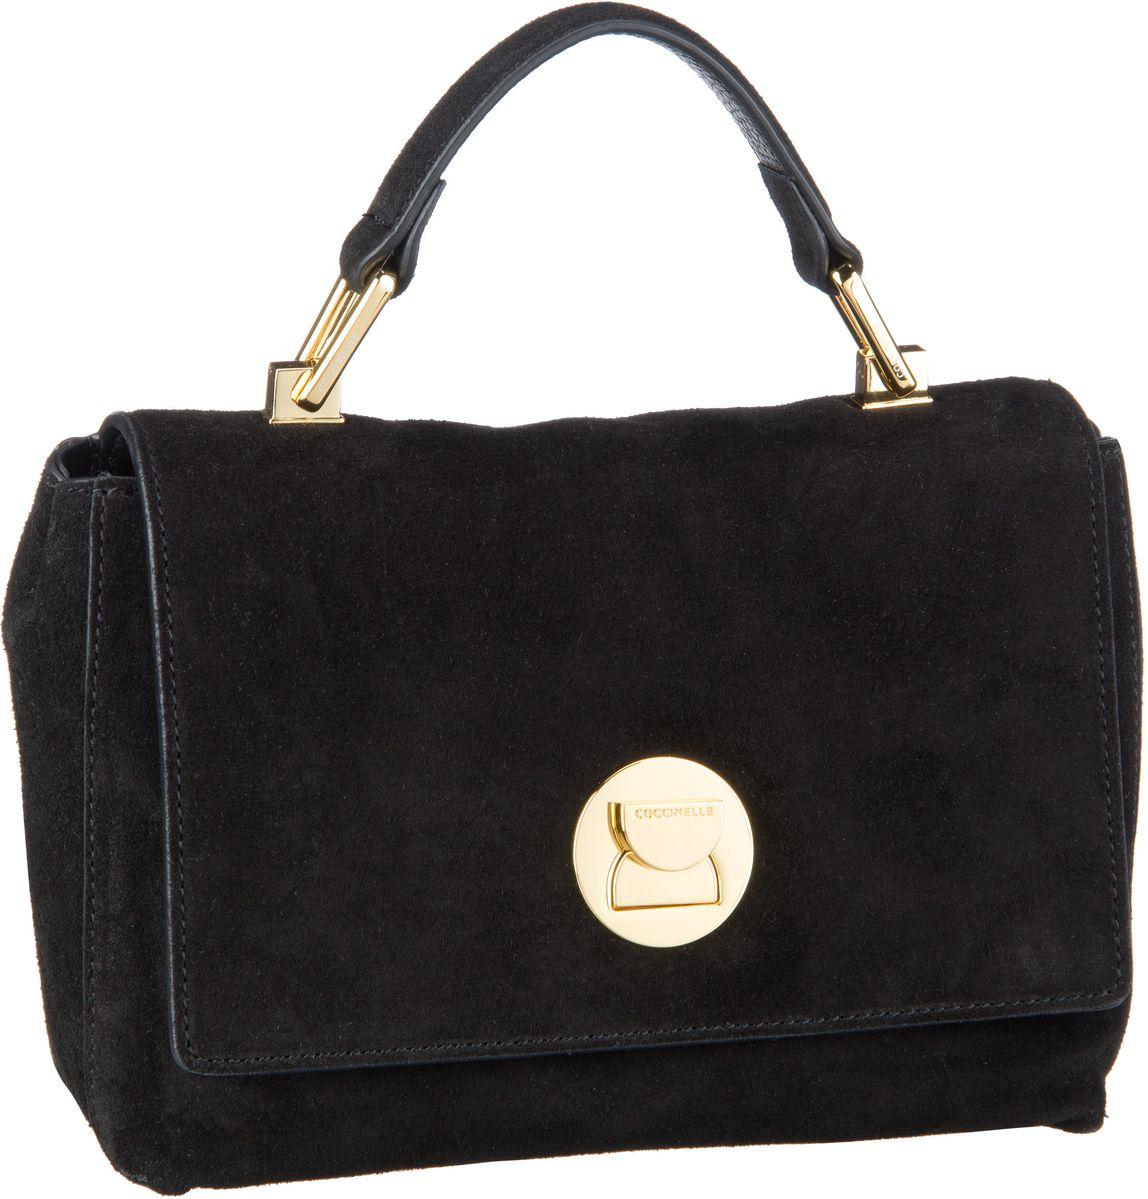 Handtasche Liya Suede 5840 Noir